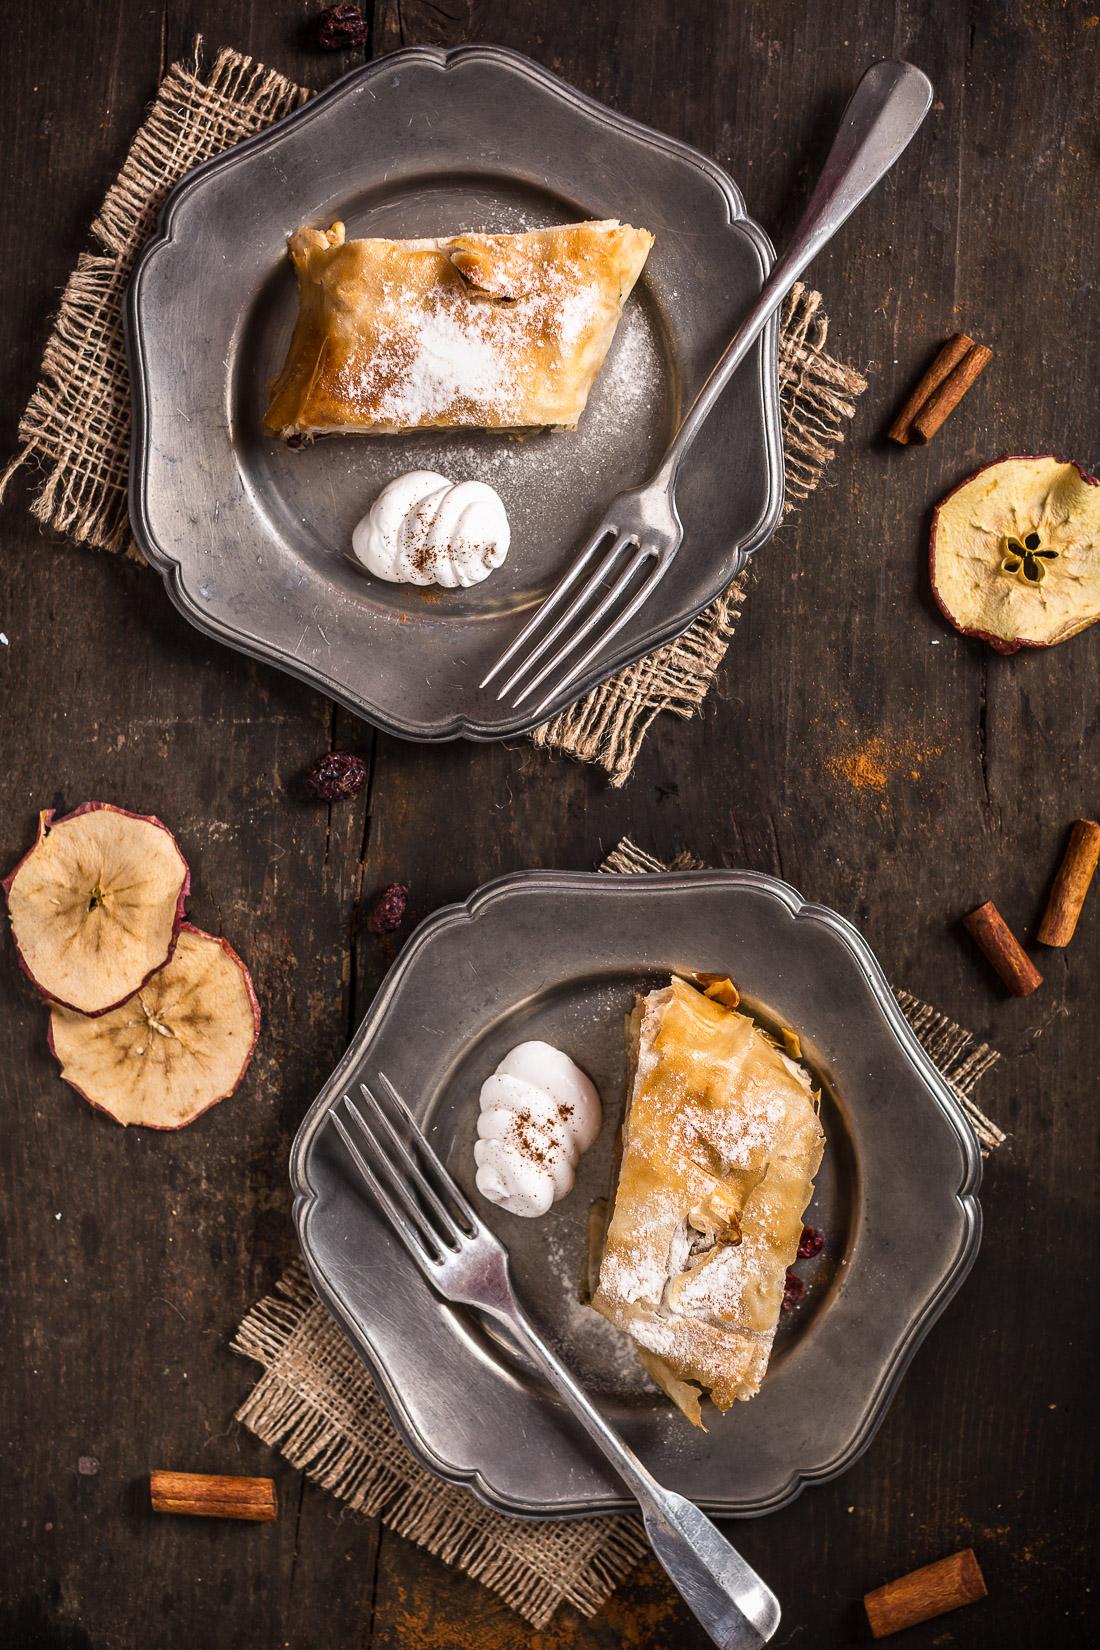 Vegan apple strudel recipe Ricetta Strudel di mele vegan apfelstrudel